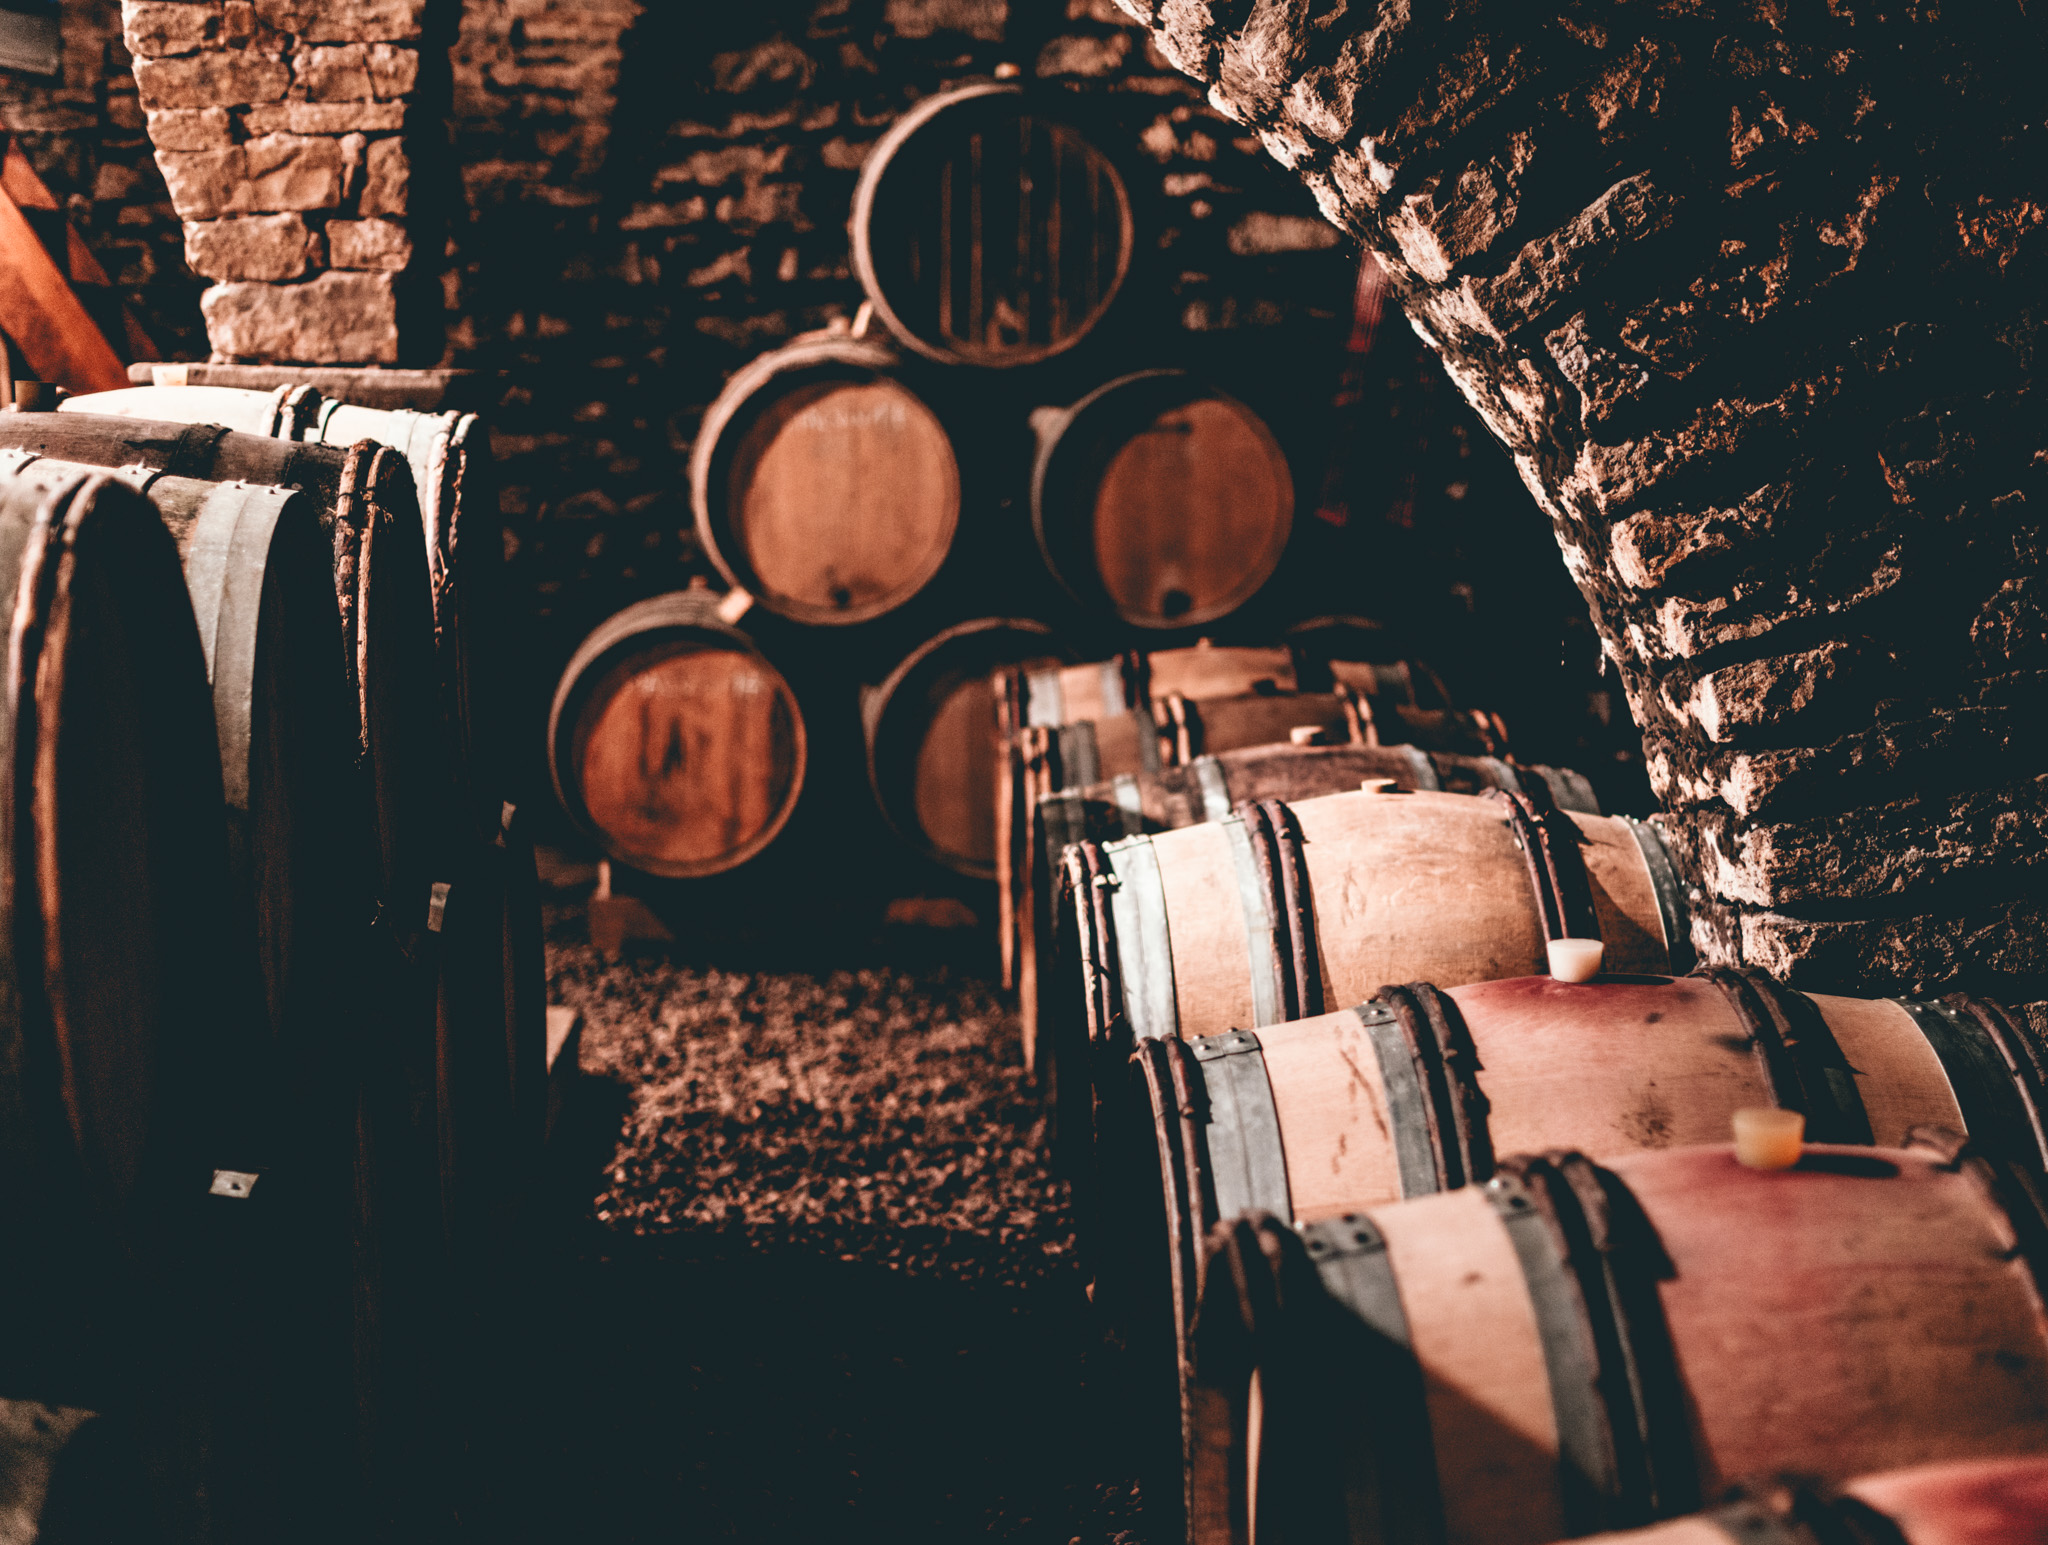 France : Jura : In the cellar at Jean-Luc Mouillard